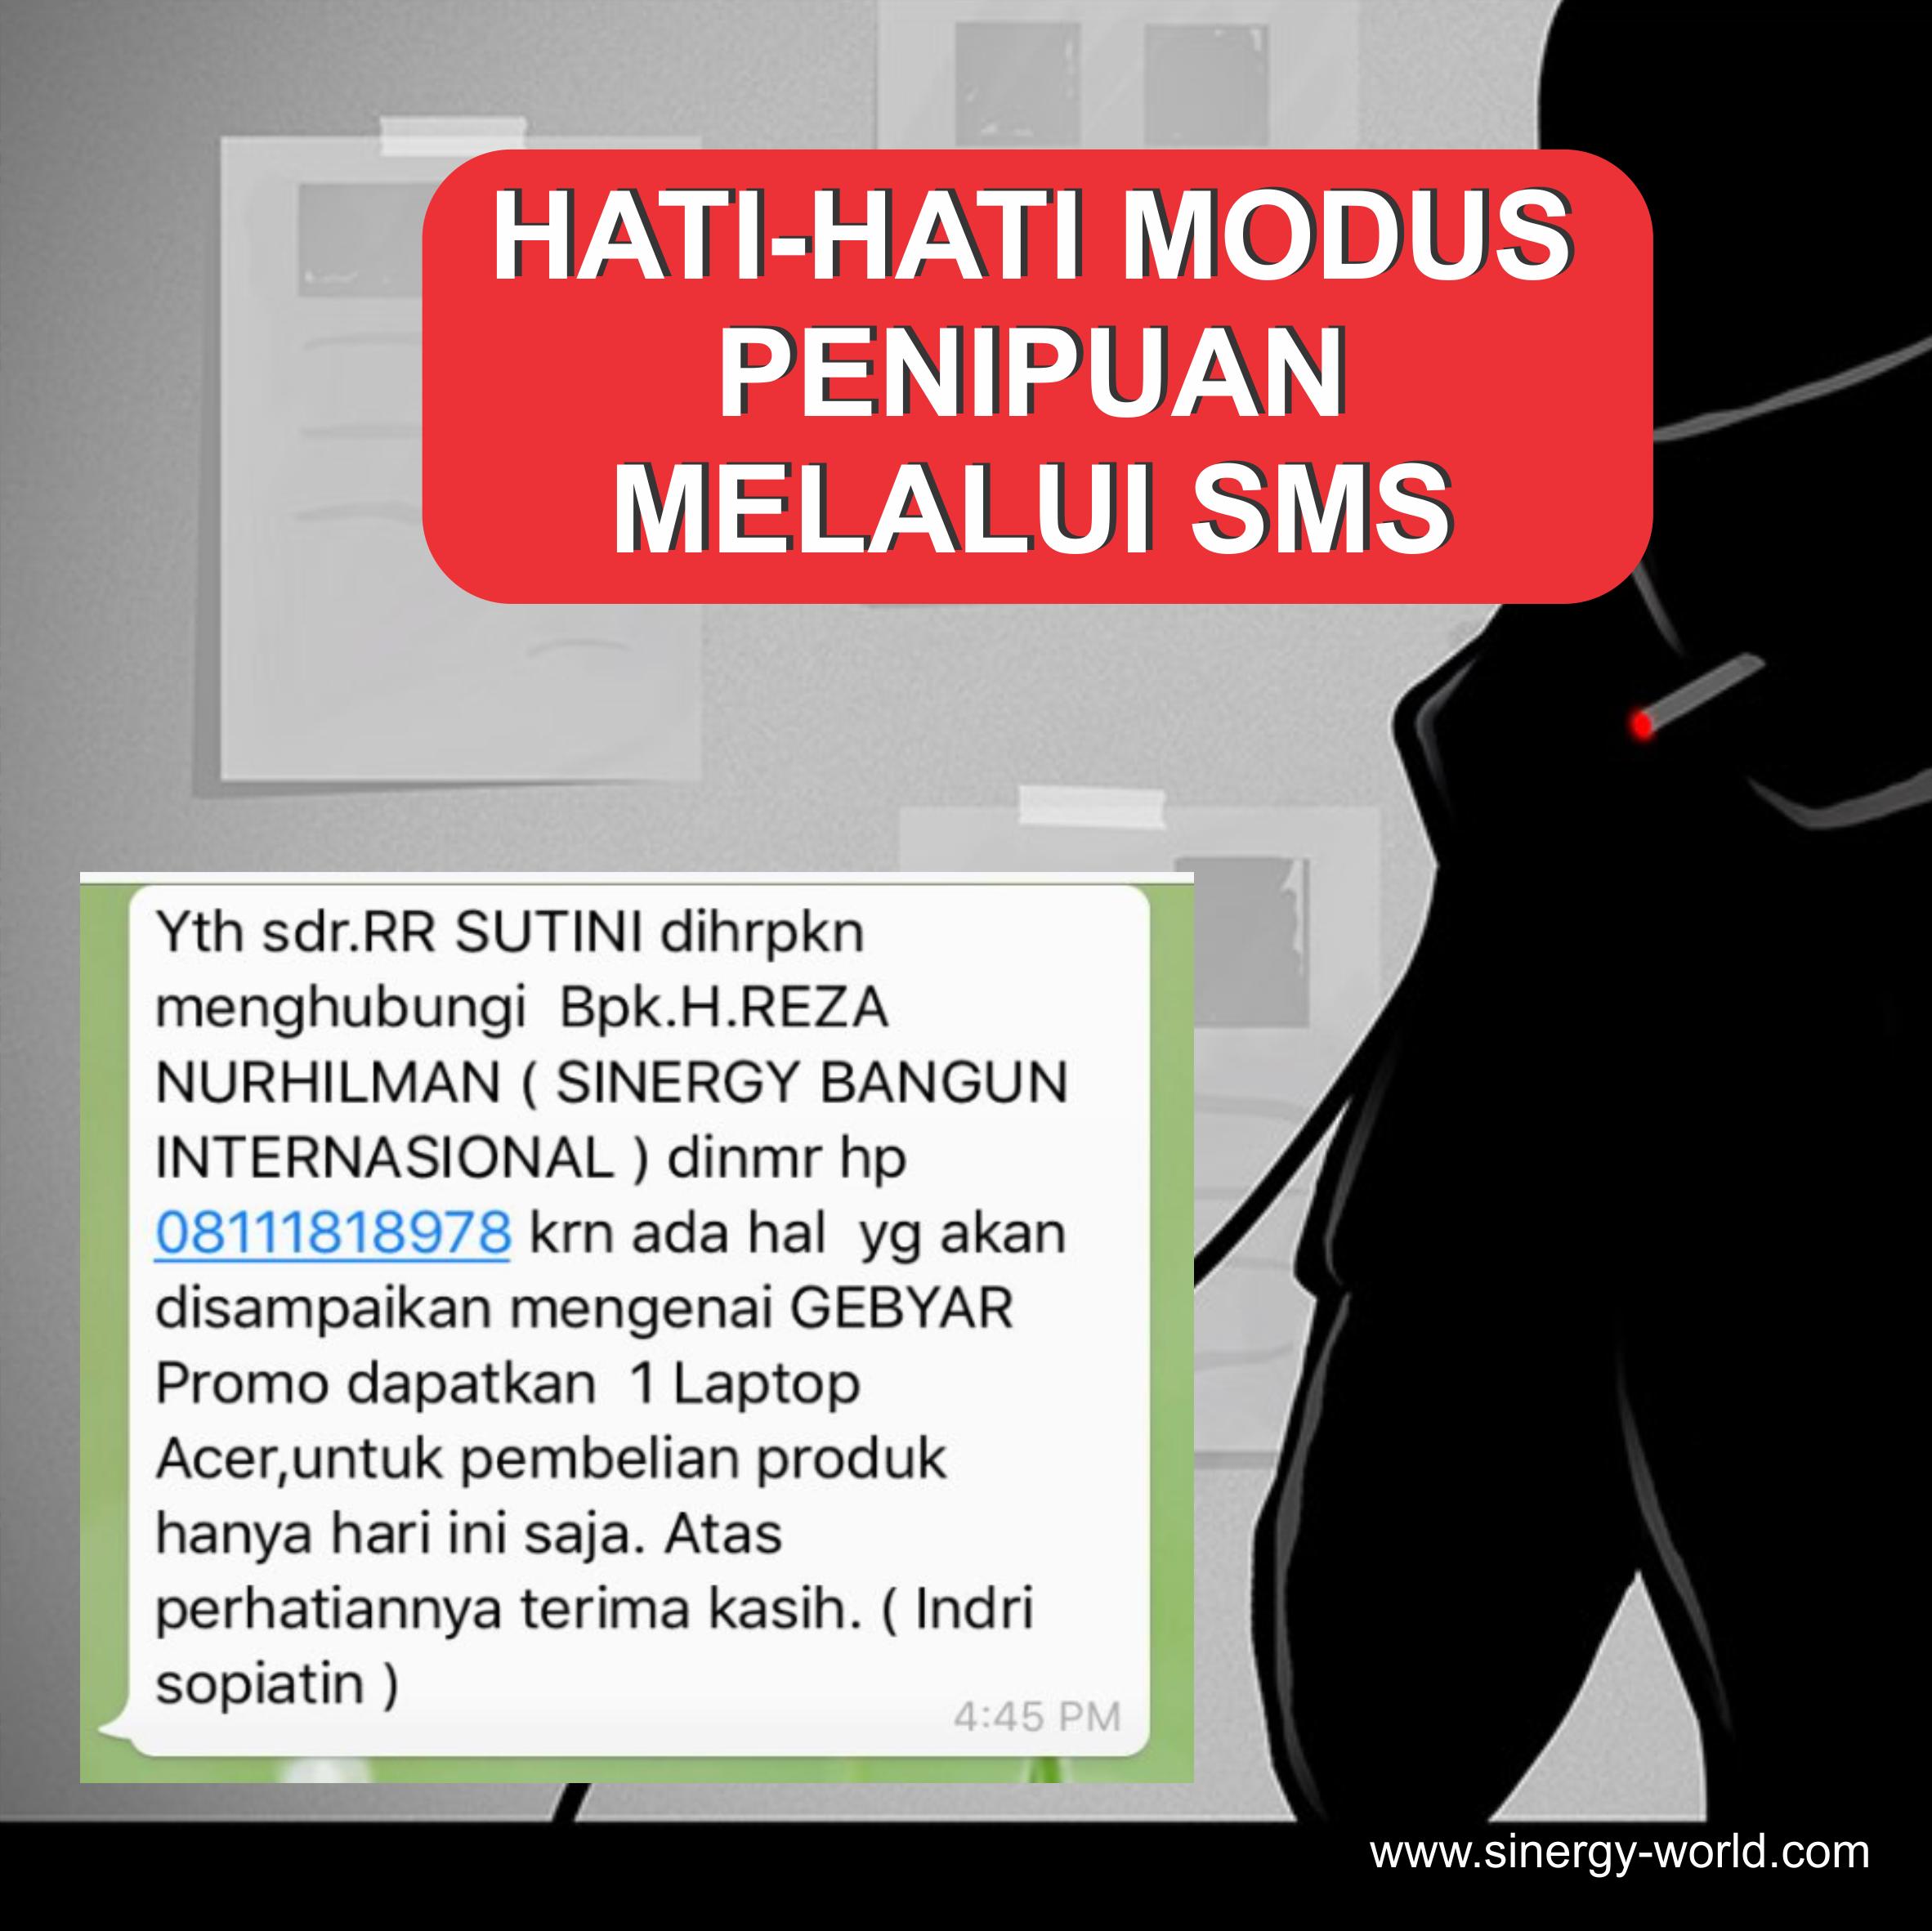 Hati-hati Modus Penipuan Melalui SMS